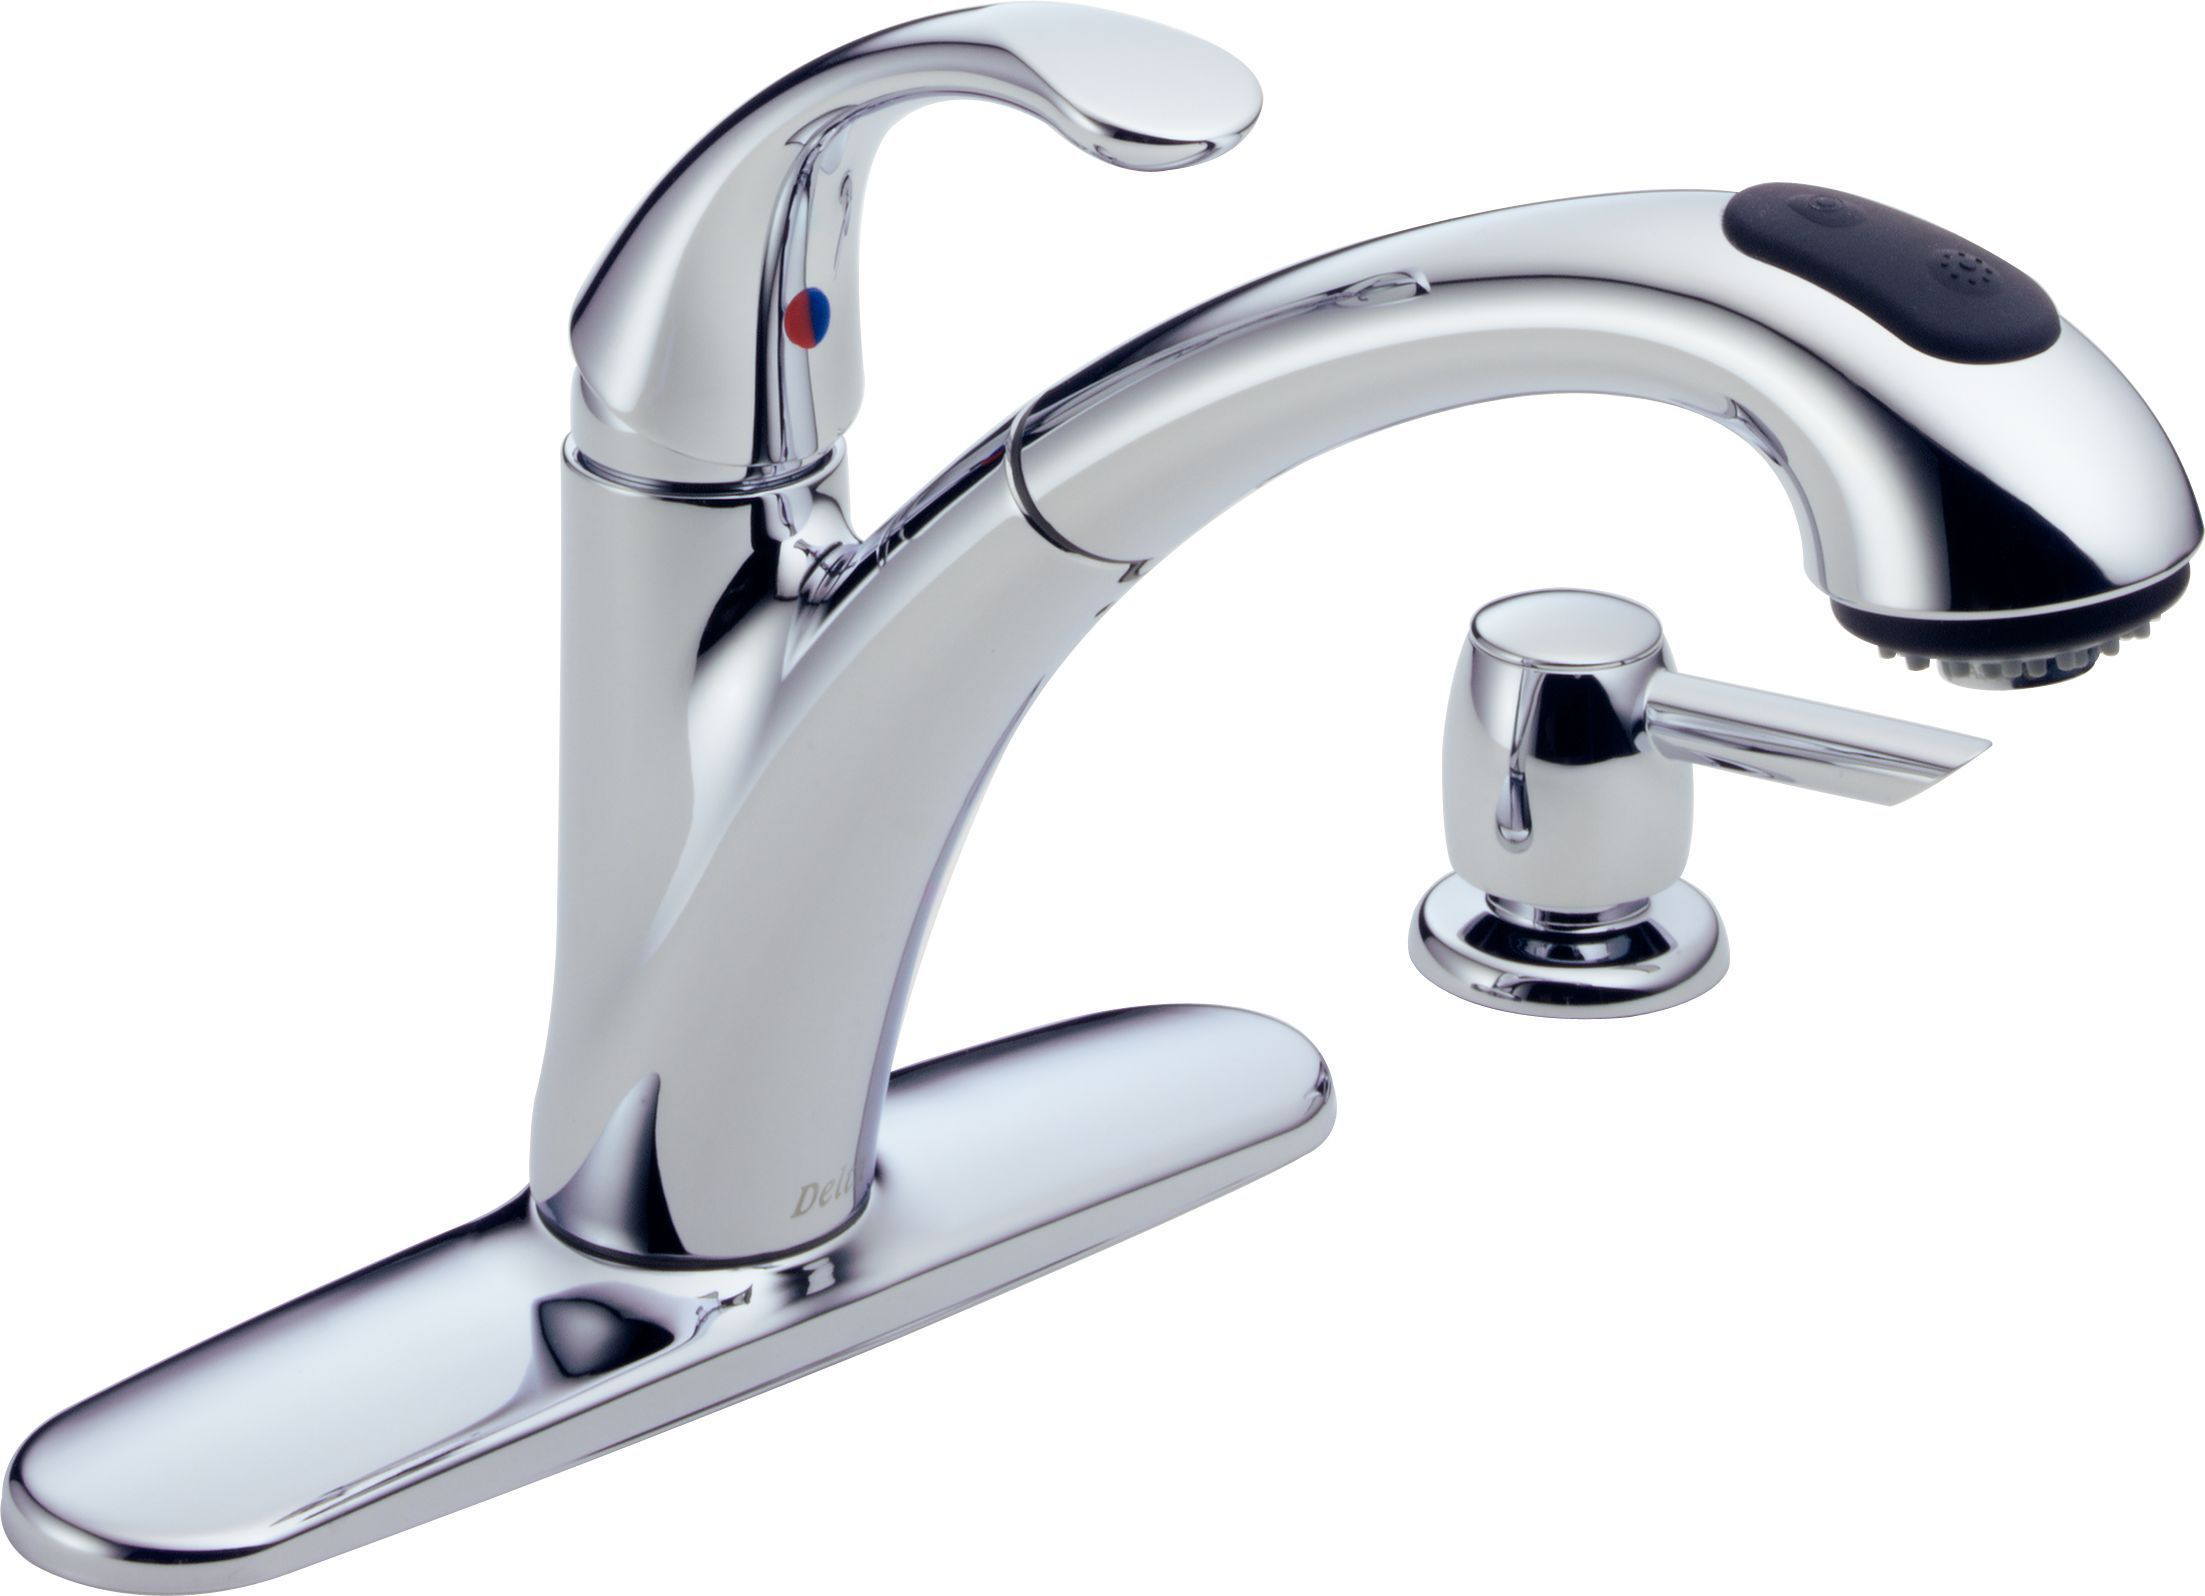 Kitchen Sink Faucets Home Depot Kitchen Sink Kitchen Sink Faucets Sink Style Kitchen Design Layout Ideas Kitchen Sink Faucets Keran Dapur